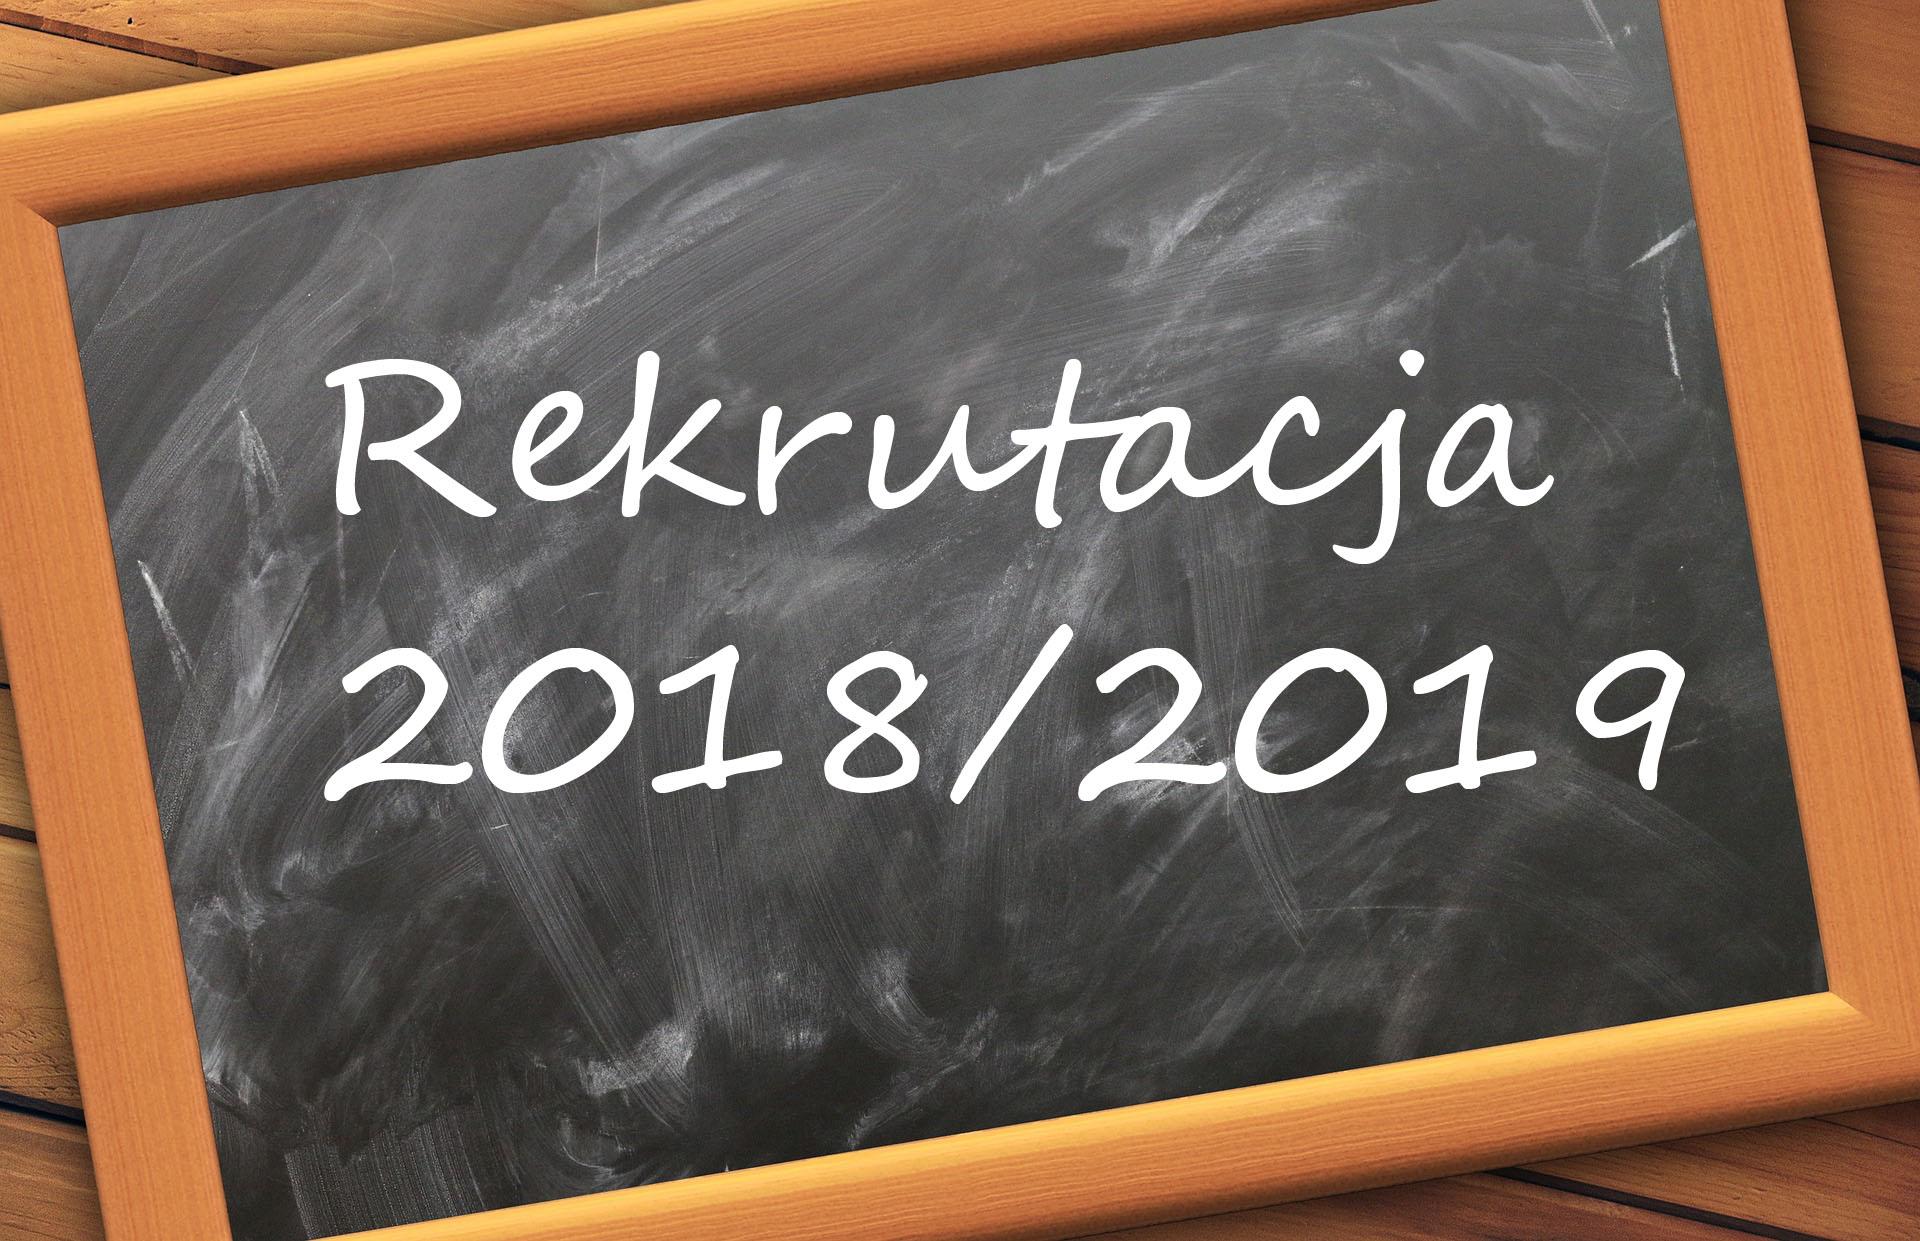 Rekrutacja na rok szkolny 2018/2019